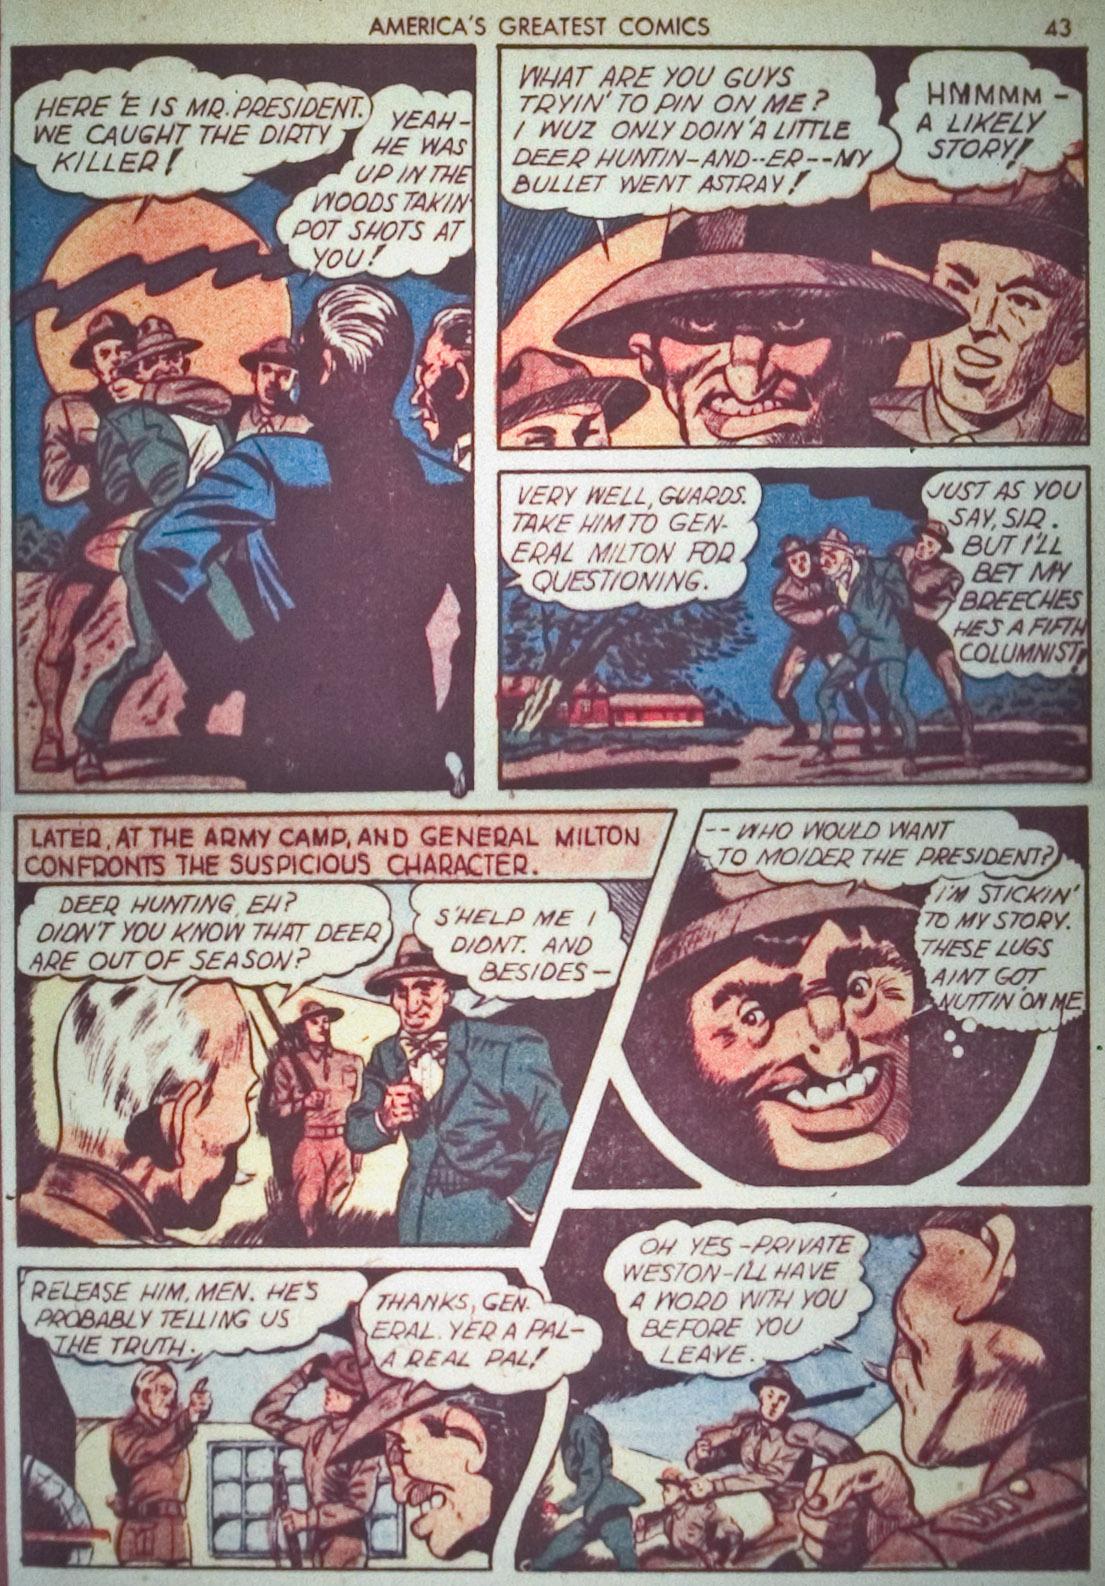 Read online America's Greatest Comics comic -  Issue #1 - 46